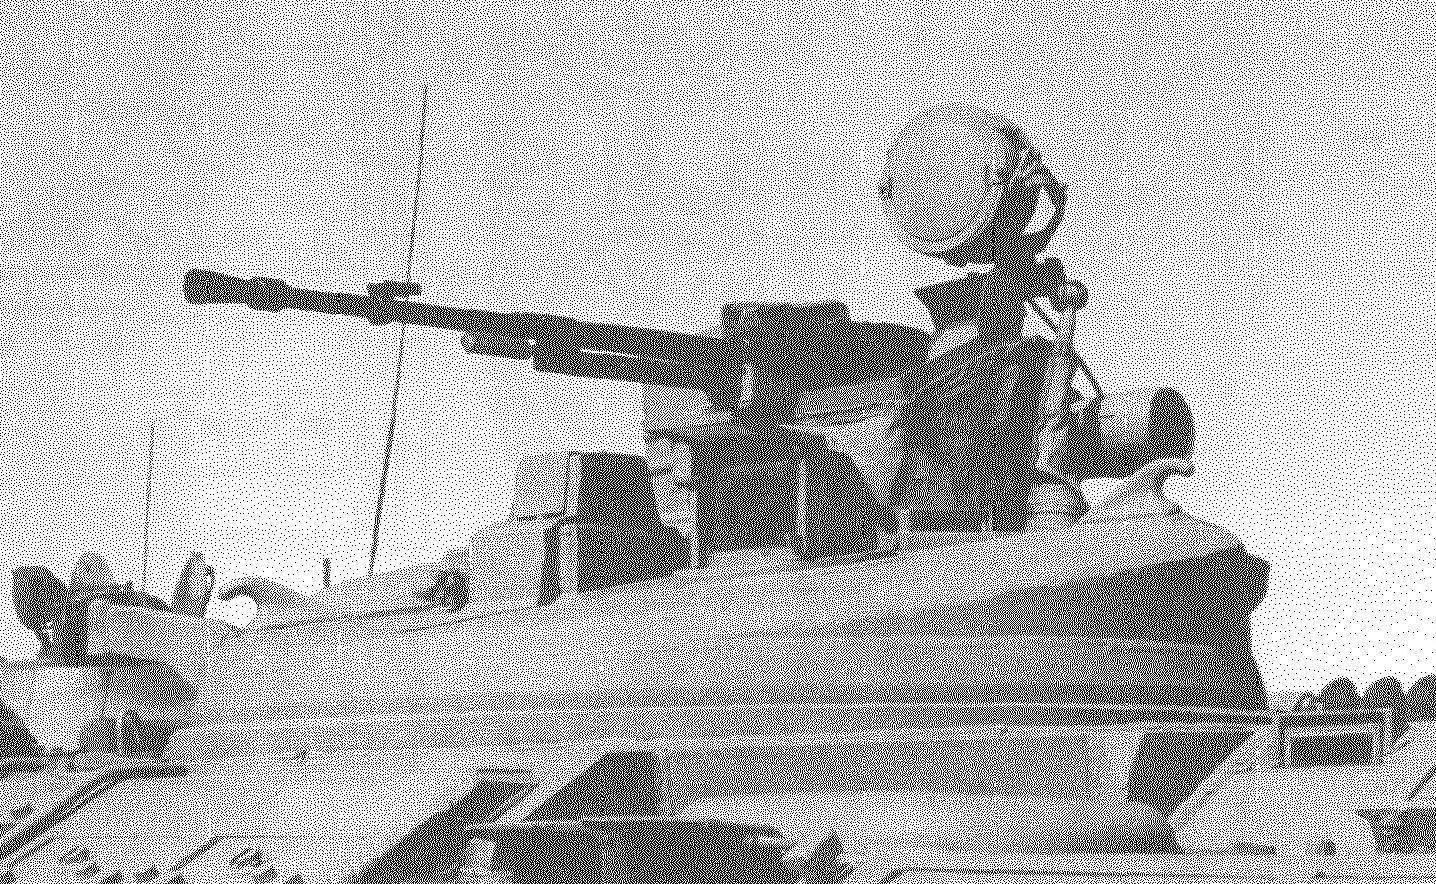 Зенитный пулемет НСВТ-2 калибра 12,7 мм